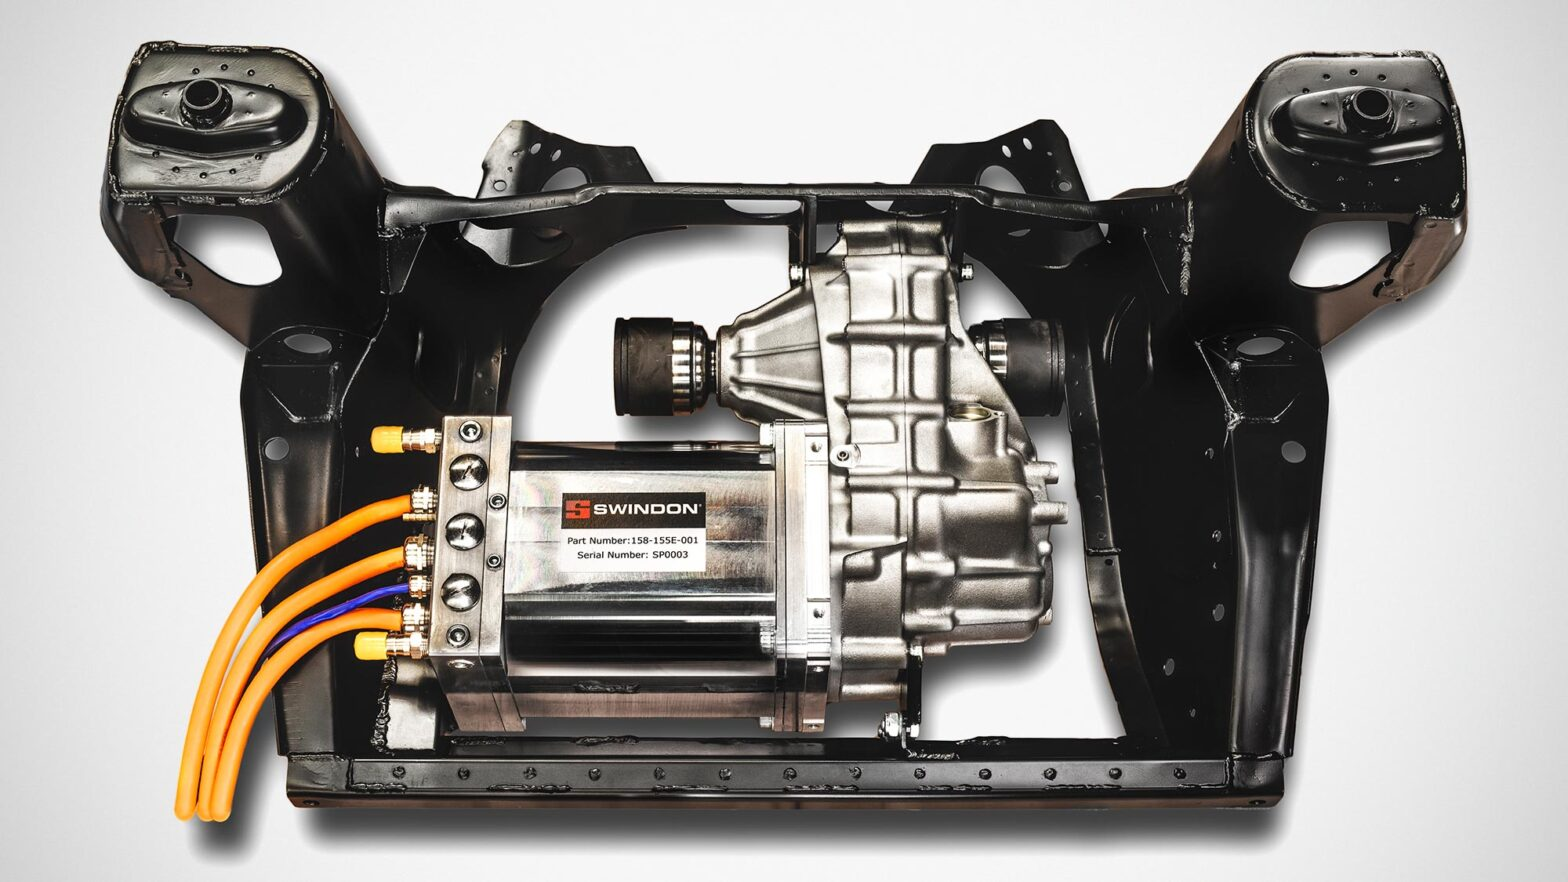 Swindon Powertrain Electric Classic MINI Kit